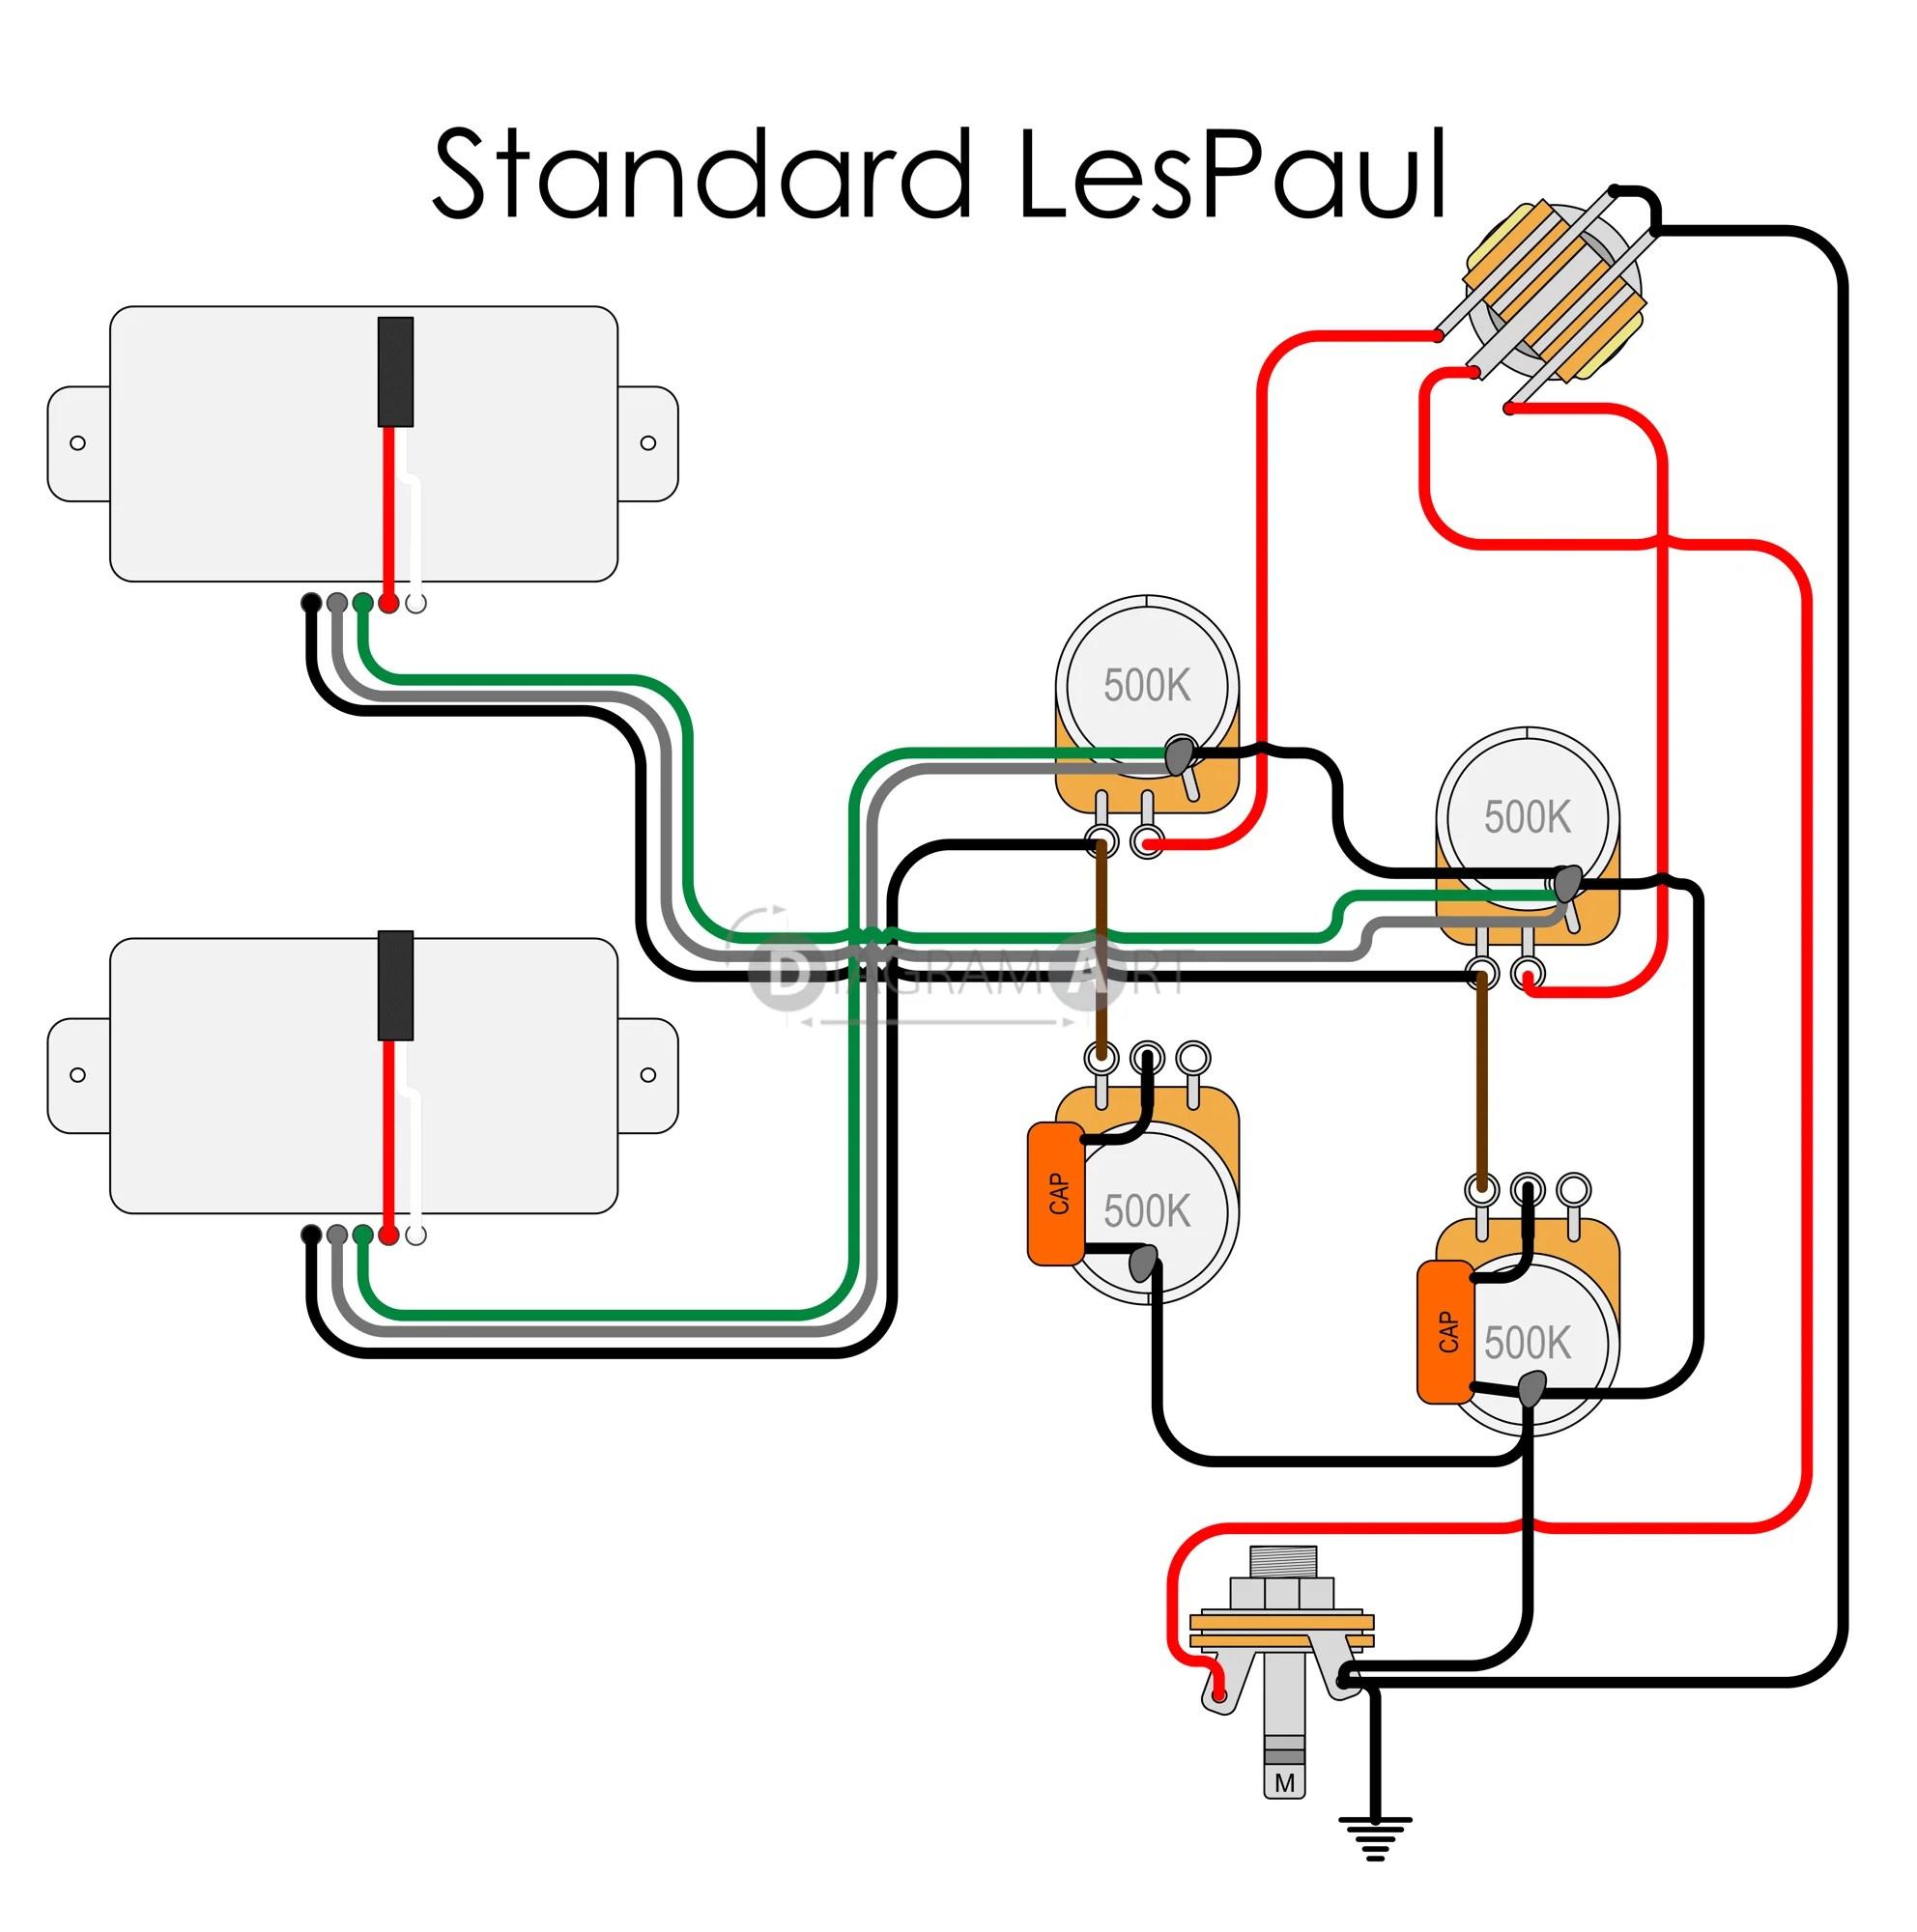 les paul standard wiring diagram 2003 nissan sentra radio peavey footswitch momentary rocker switch